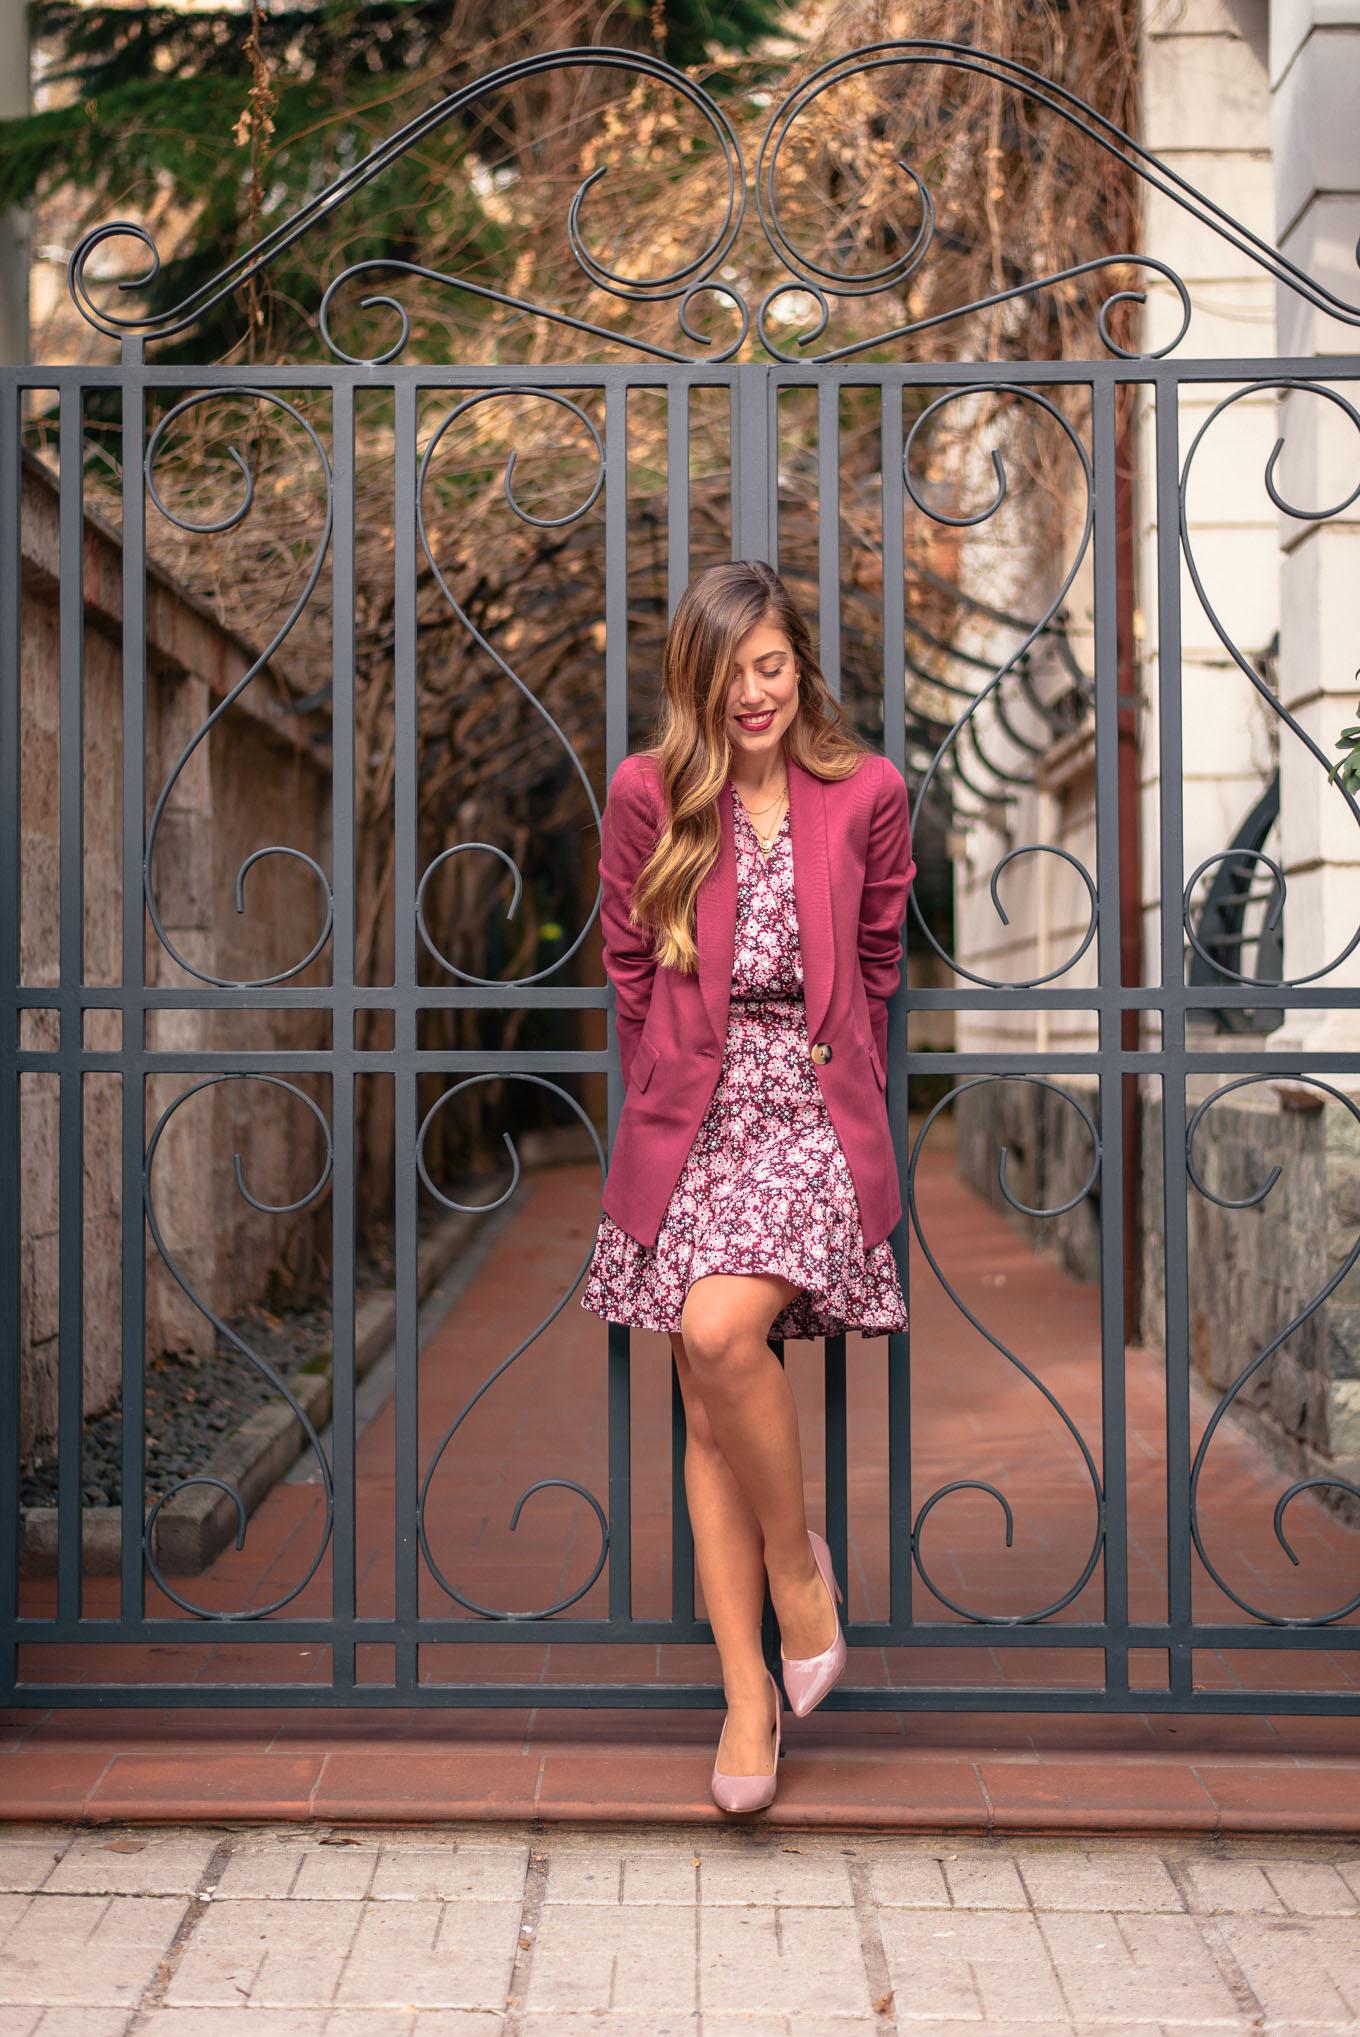 Denina Martin instagram stories - 10 empowering quotes about women